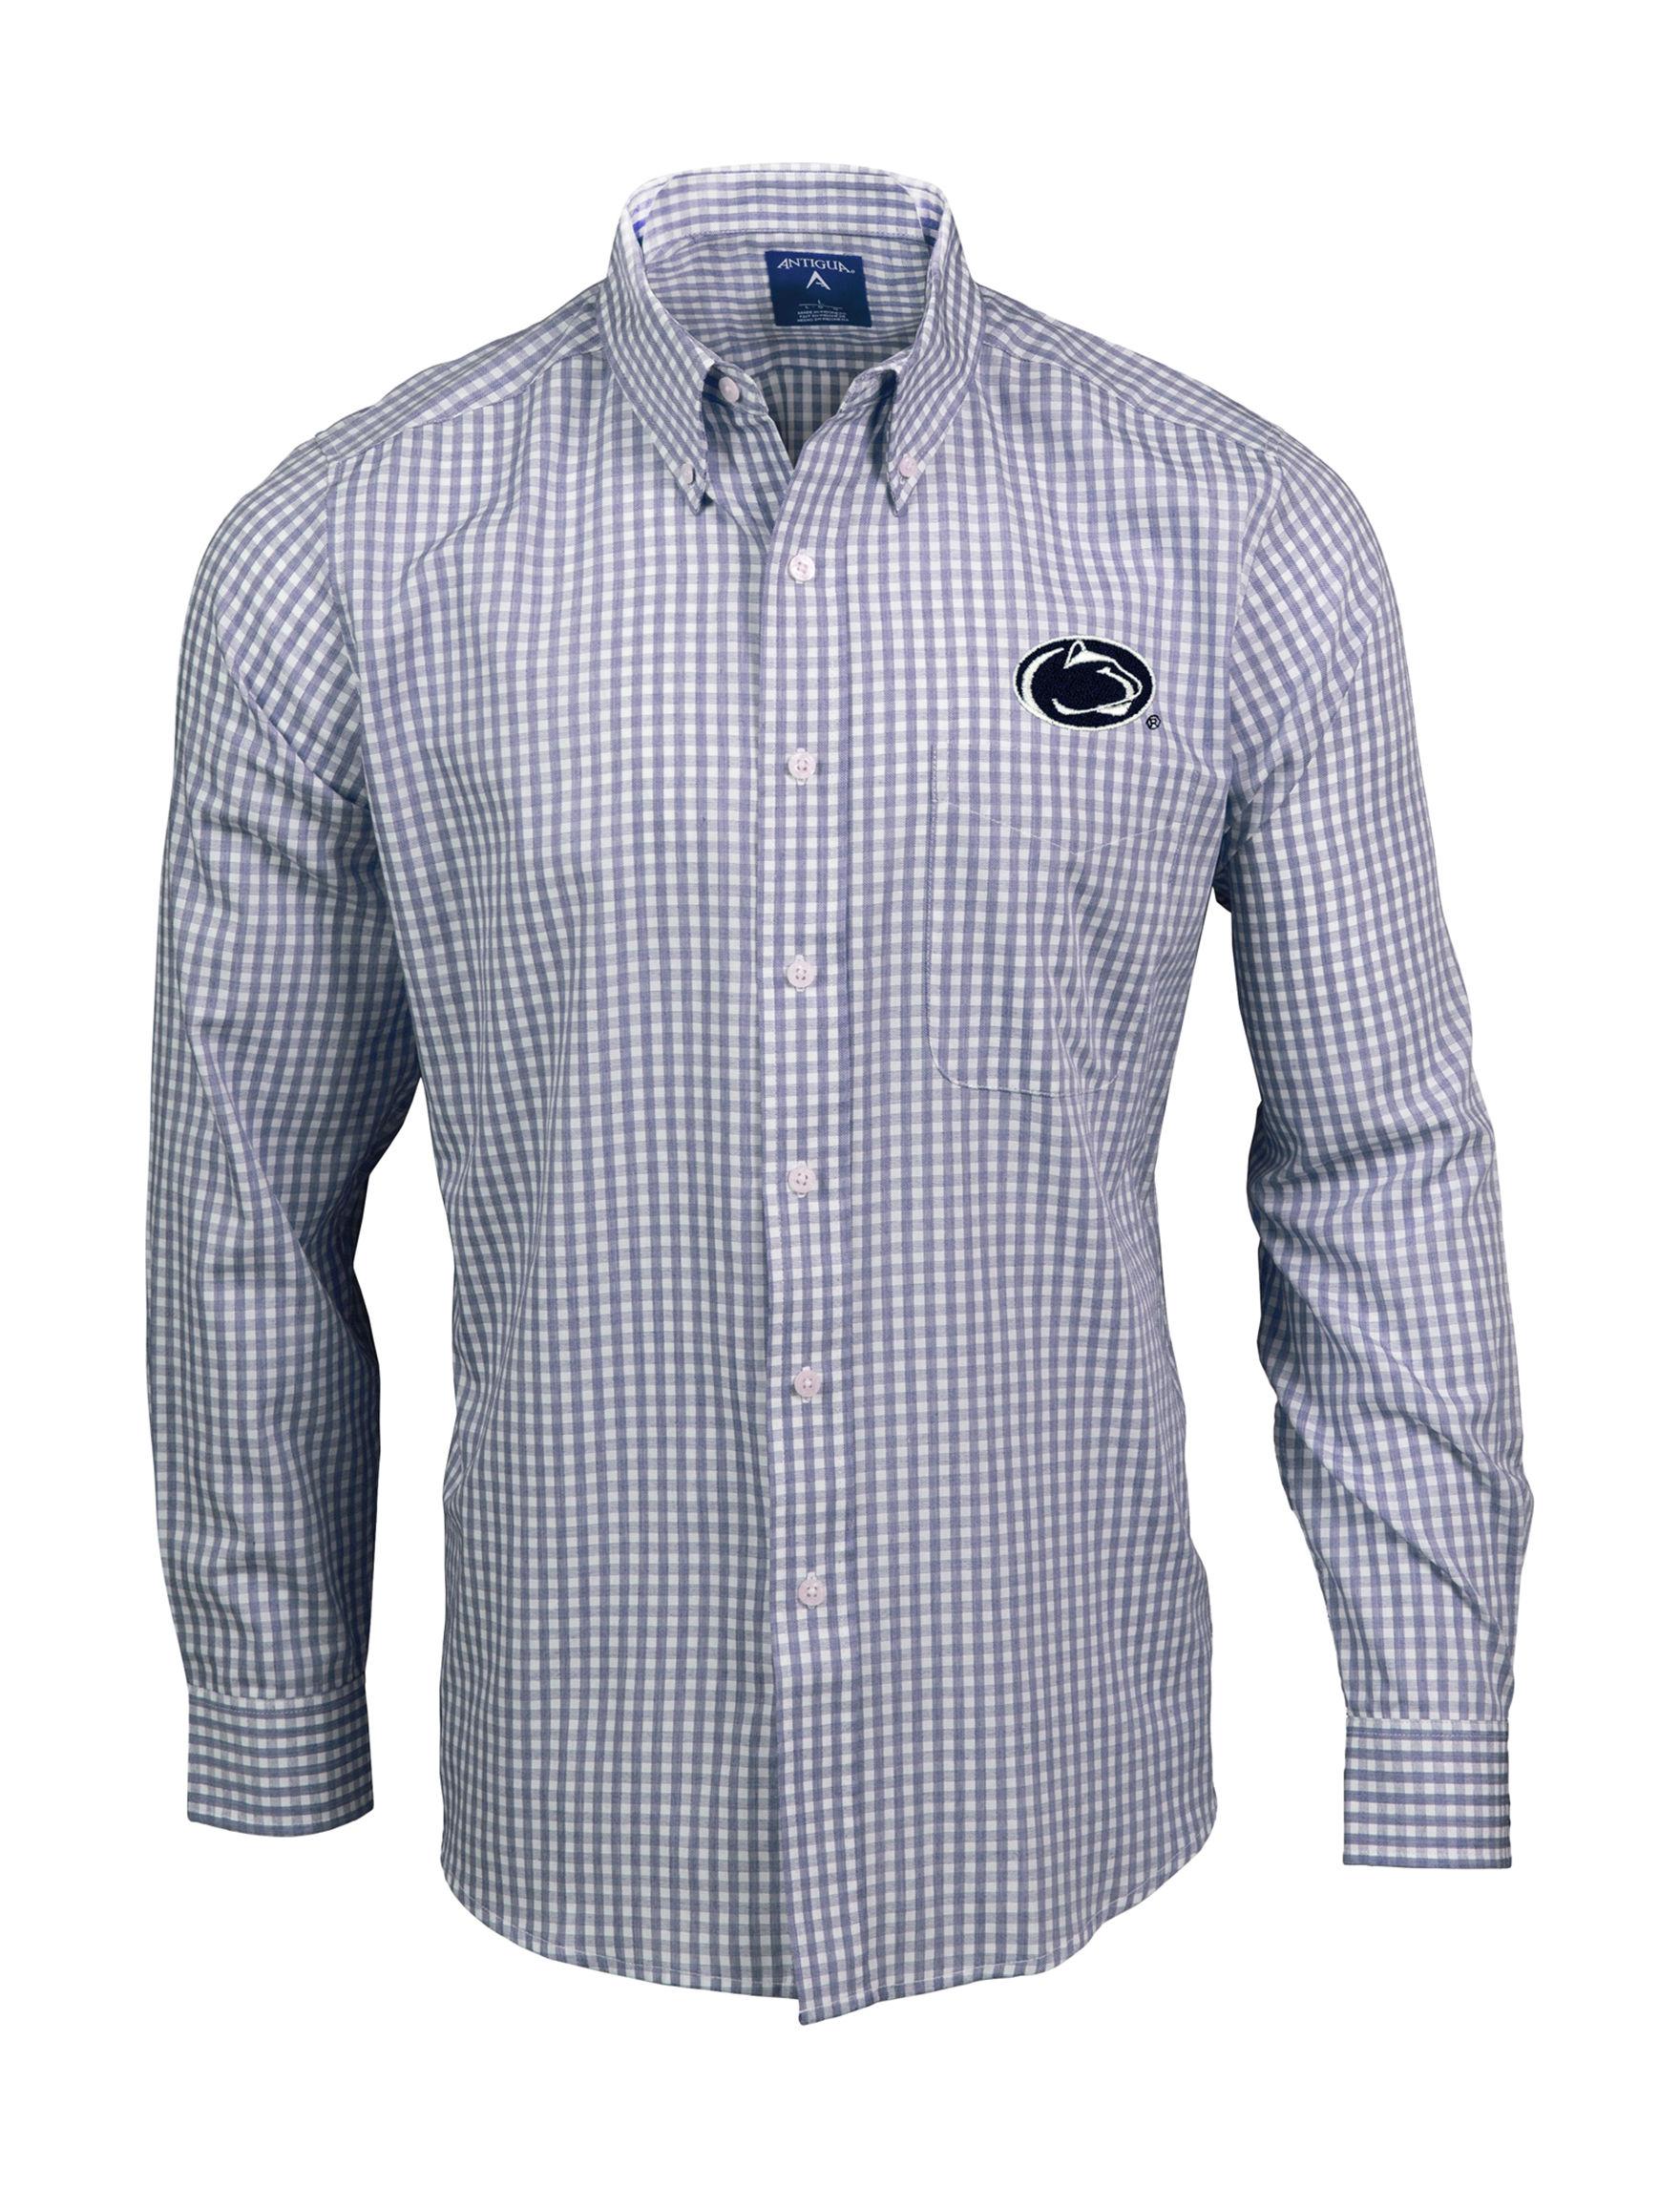 NCAA Navy / White Casual Button Down Shirts